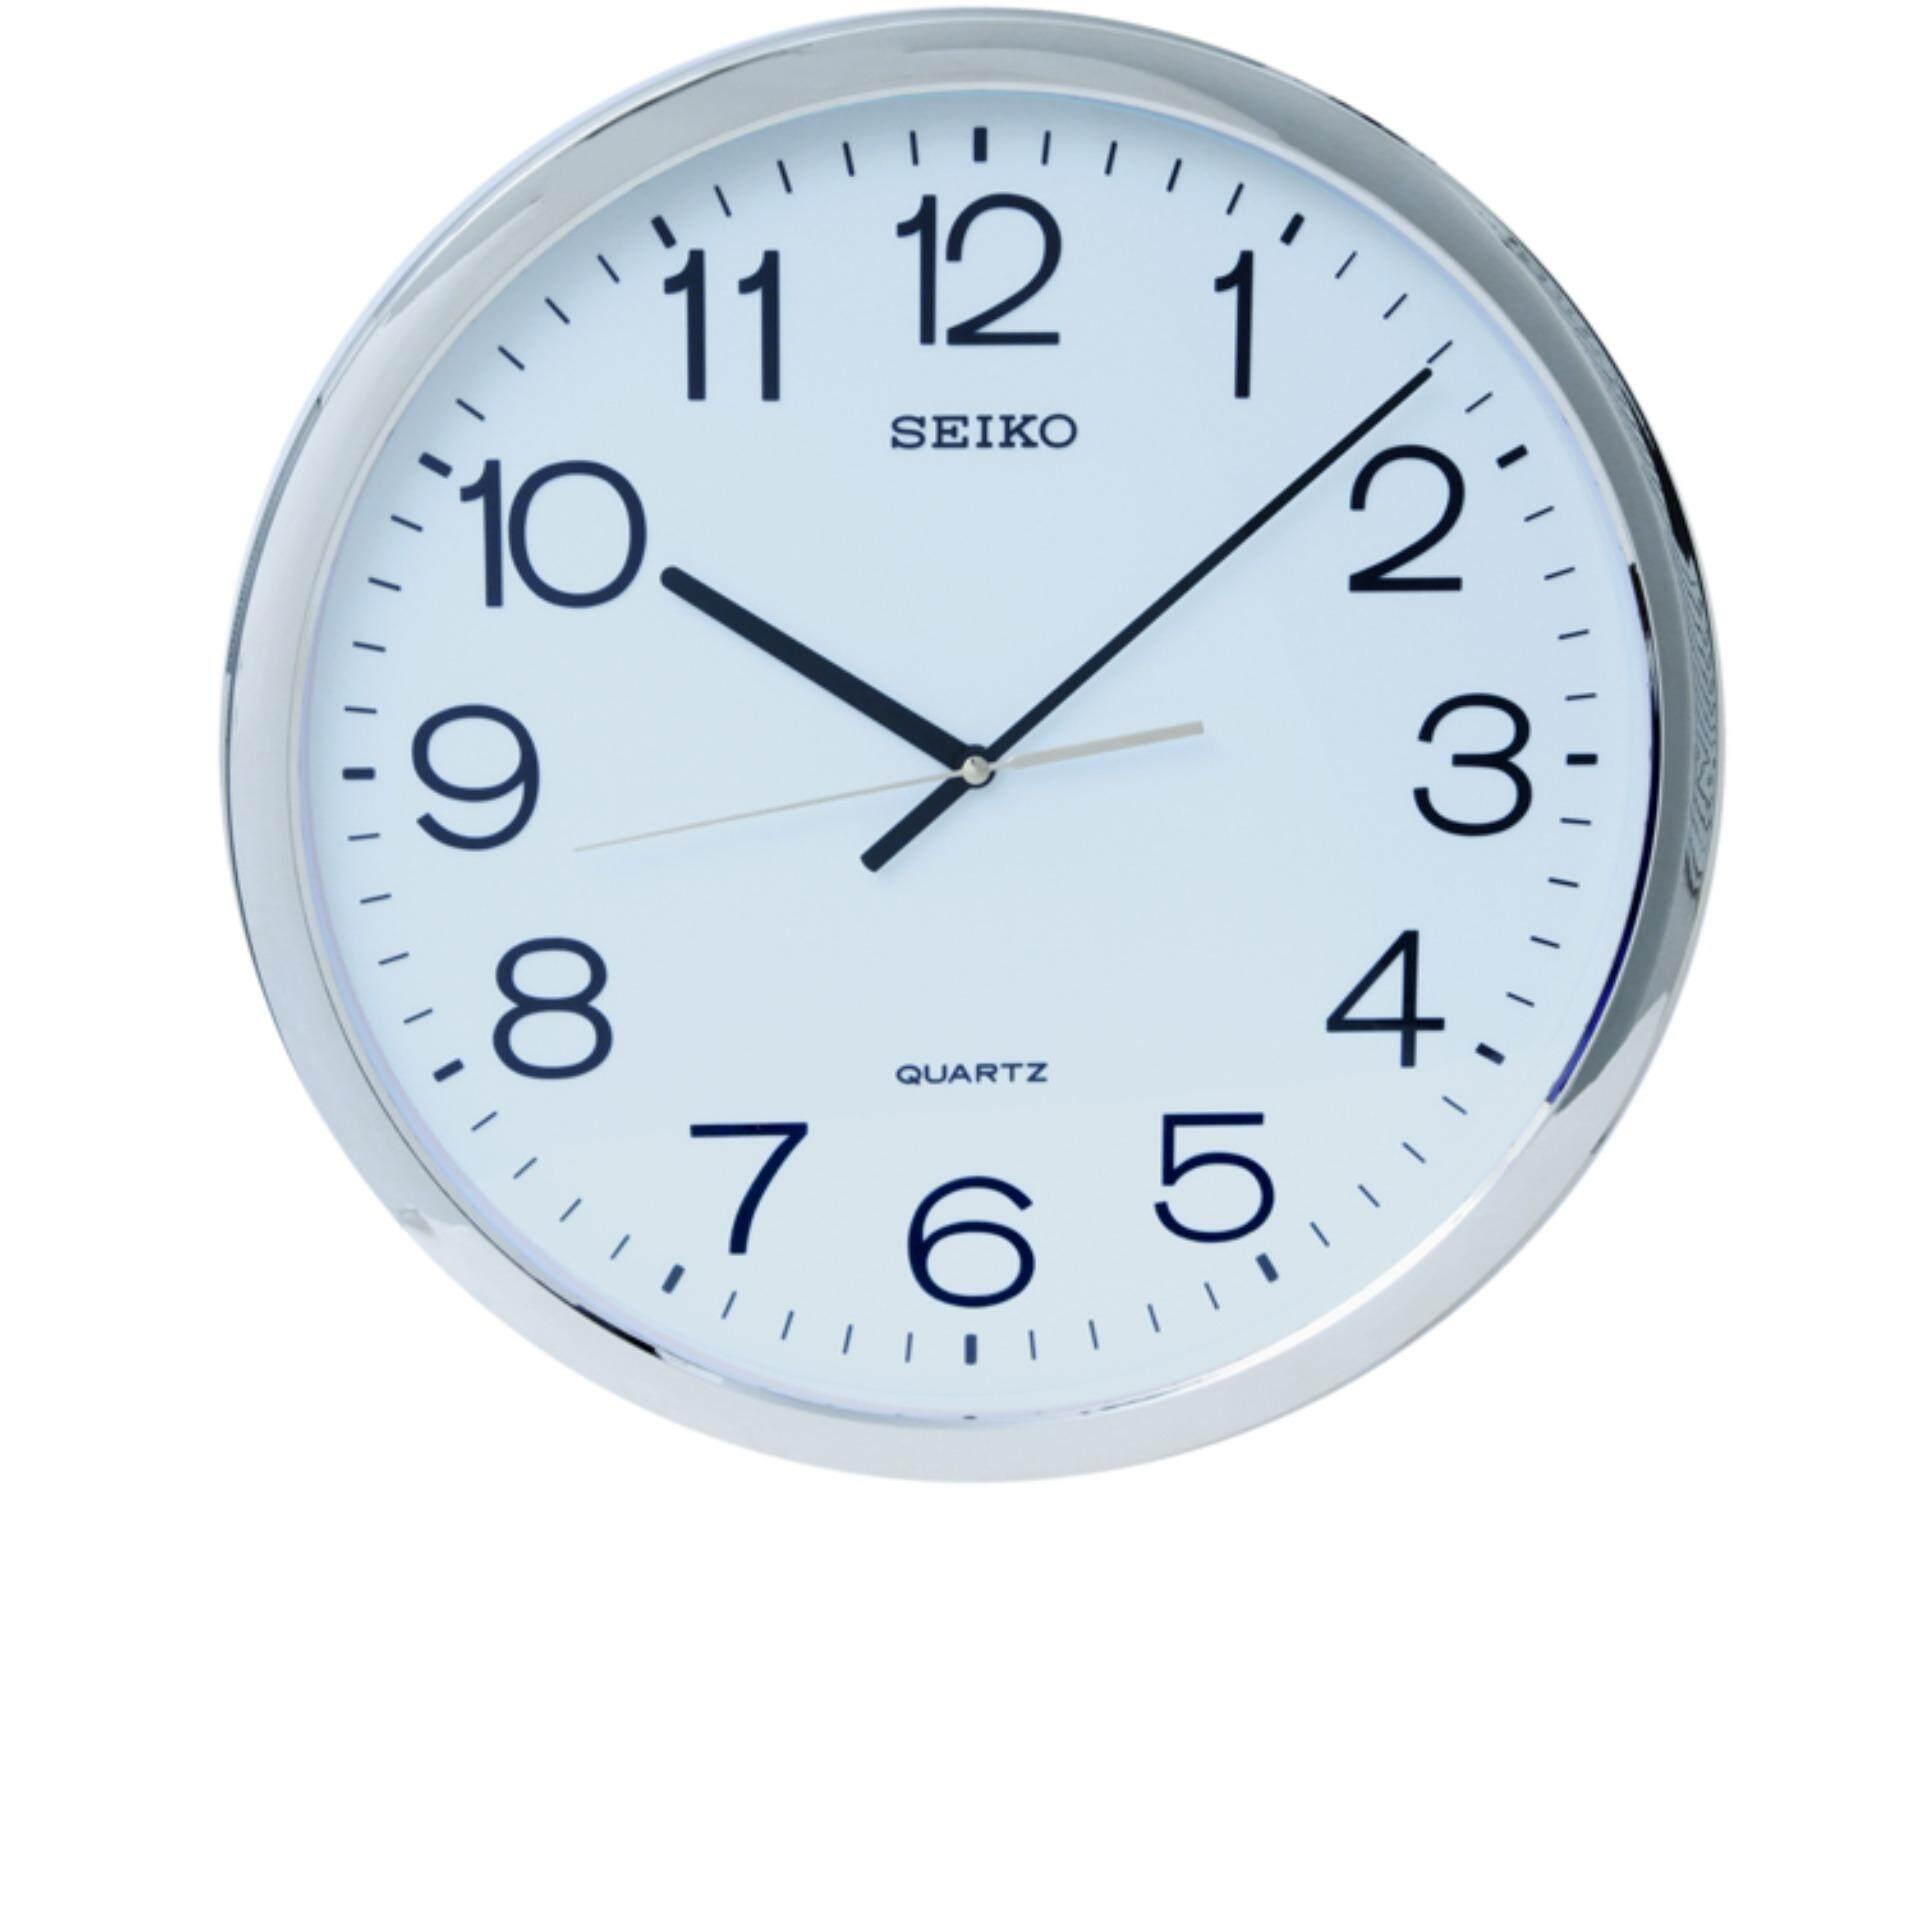 Seiko Clocks นาฬิกาแขวน รุ่น Pqa041S เป็นต้นฉบับ